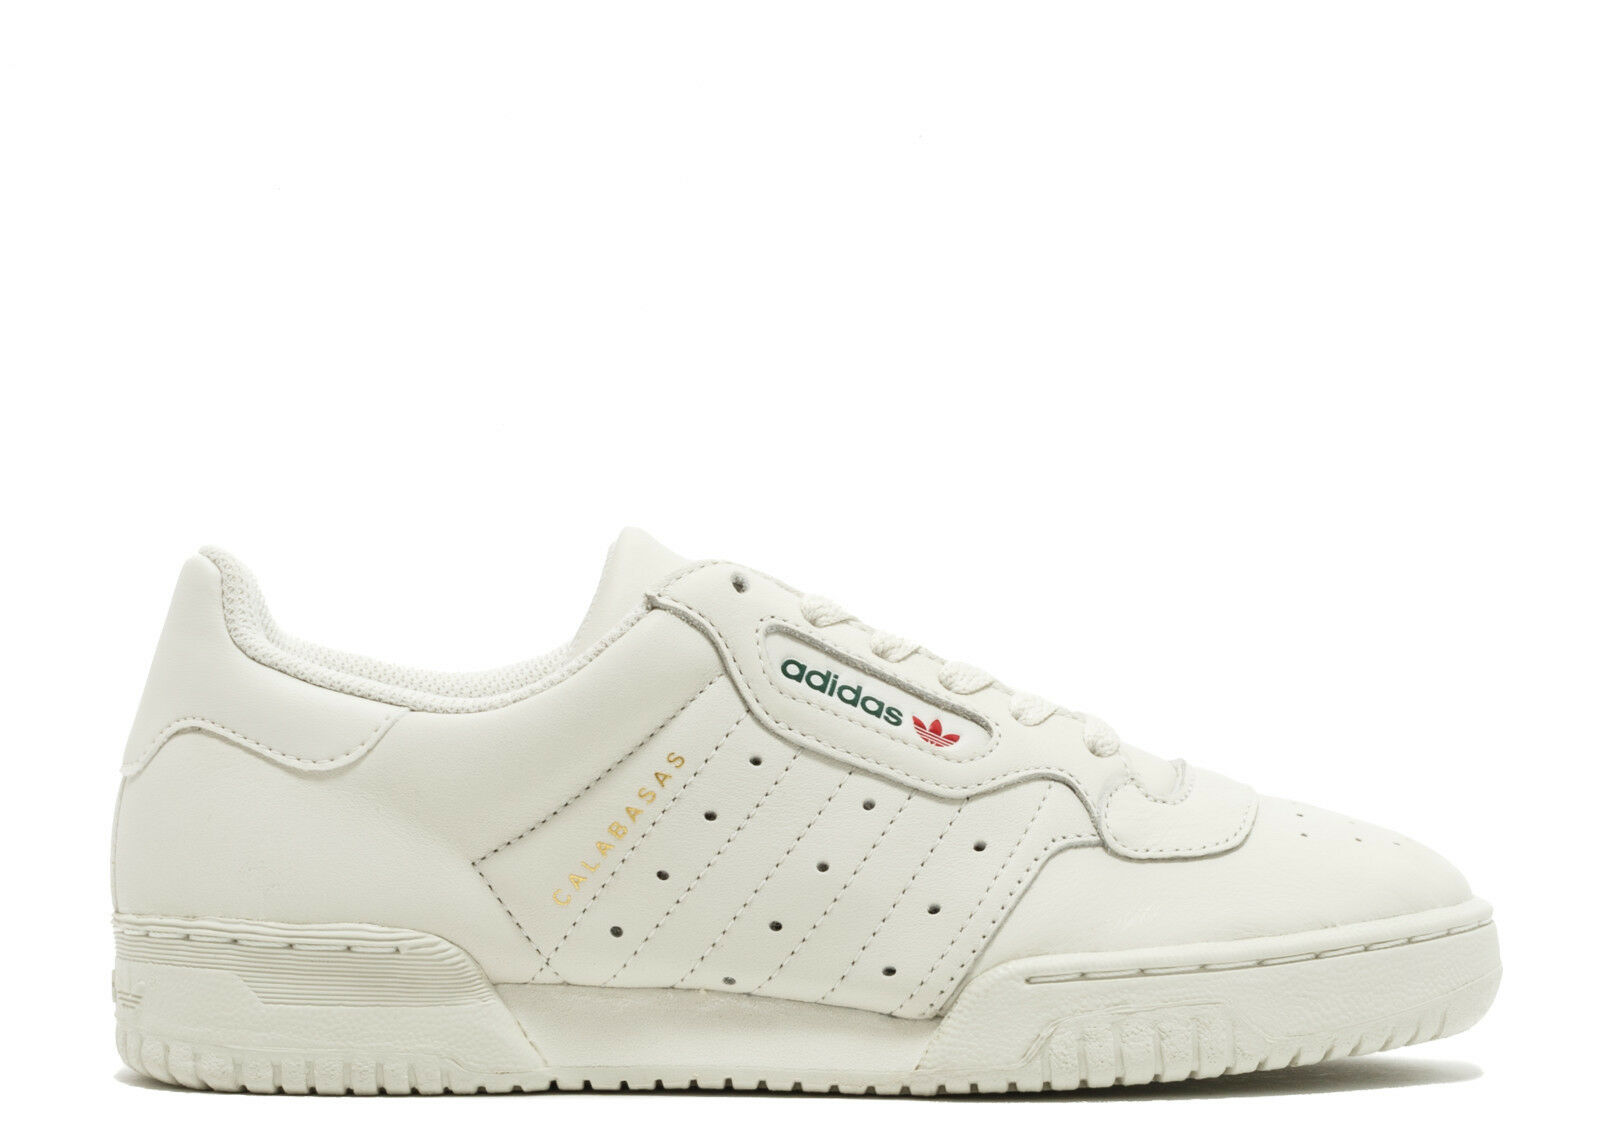 Adidas Yeezy powerphase Calabasas cq1693 Core blanco tamaño / crema og DS tamaño blanco 14 Kanye 393840